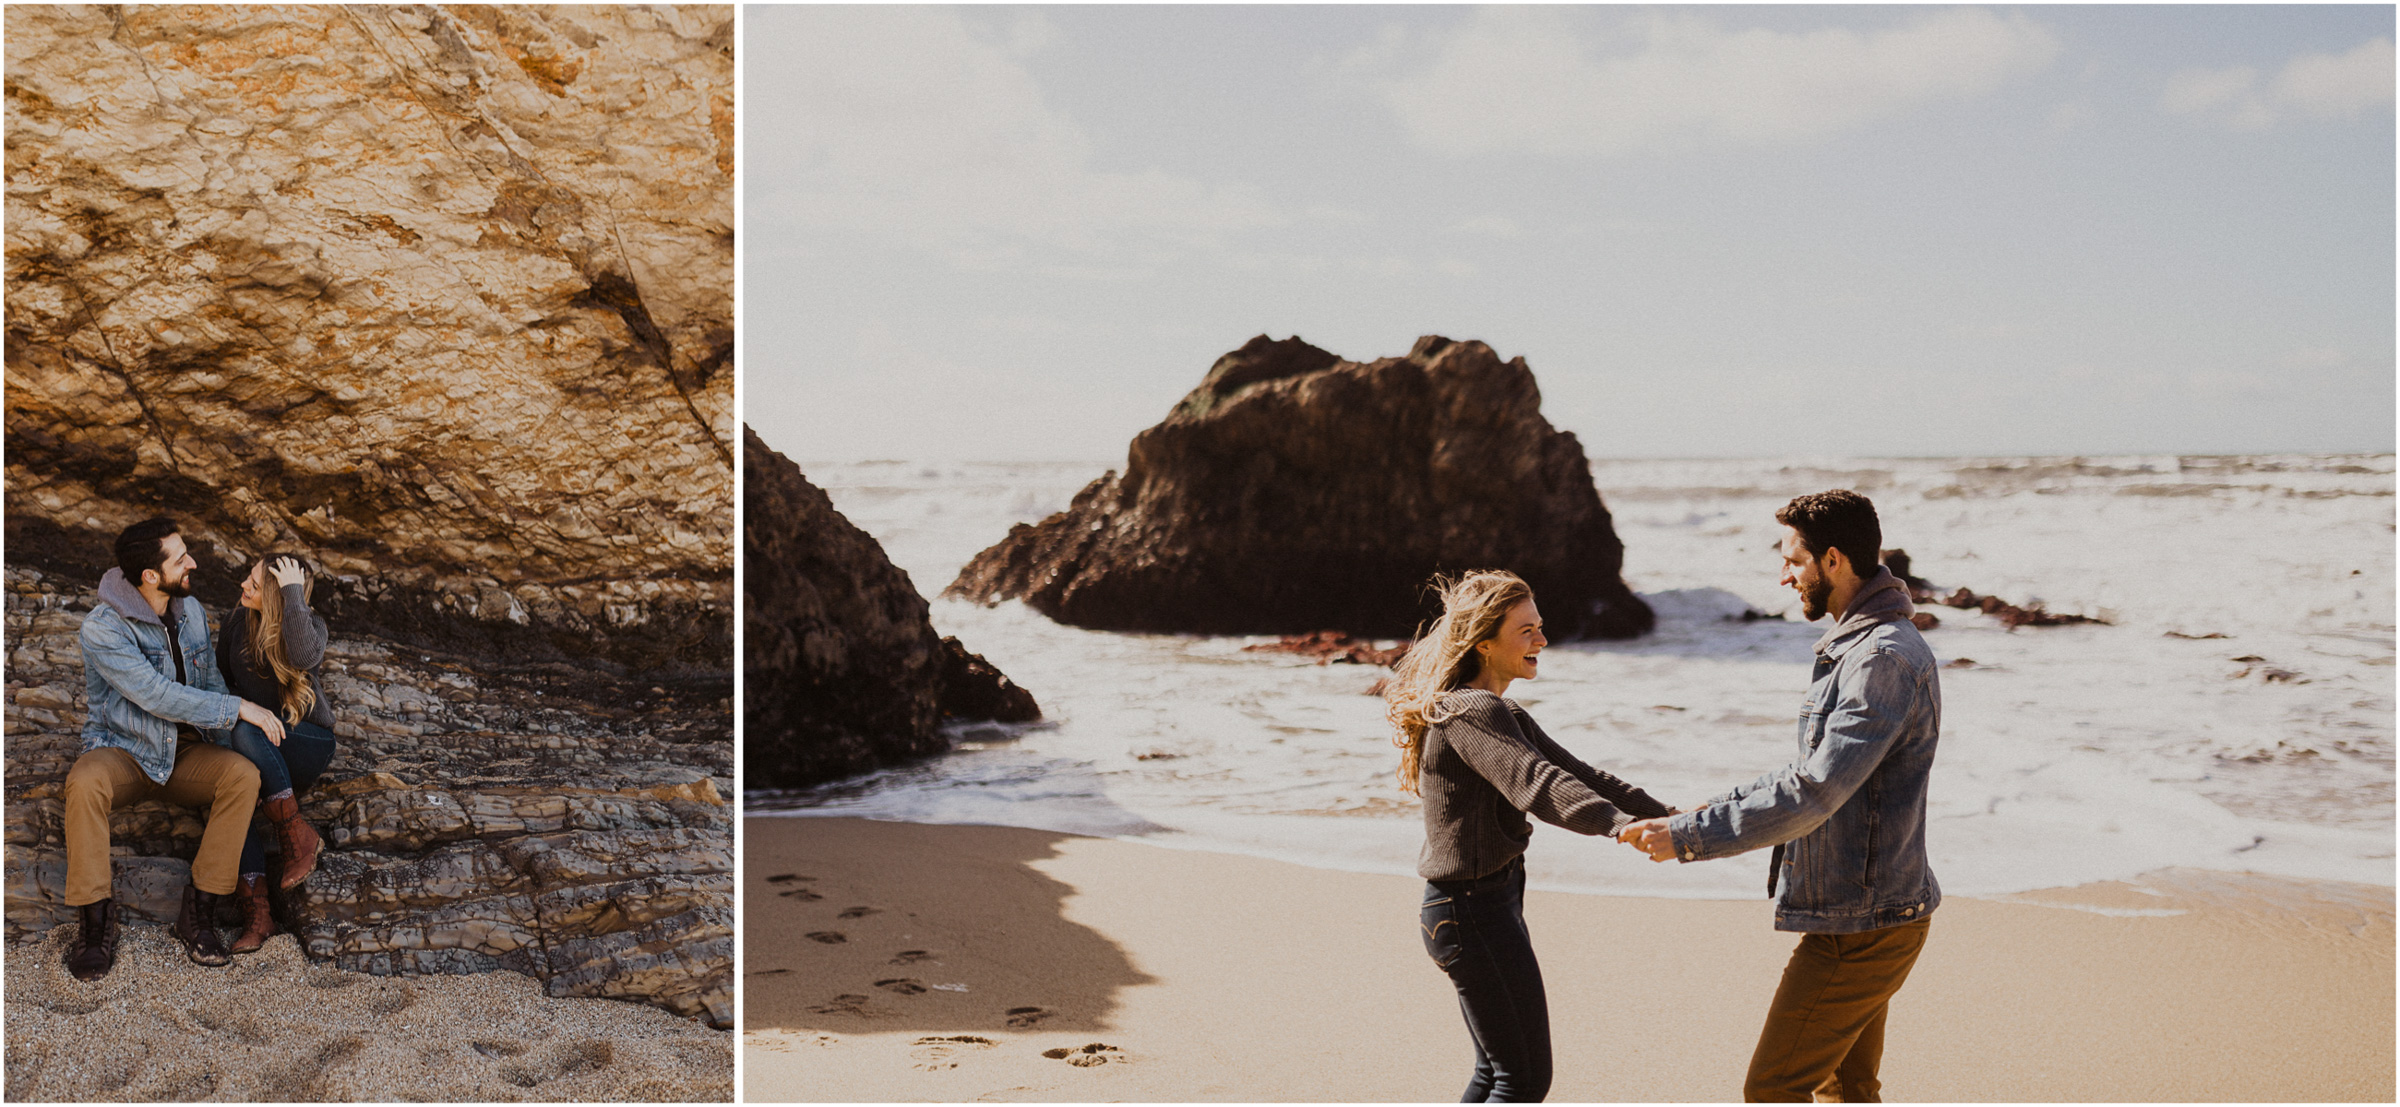 alyssa barletter photography santa cruz beach engagement california photographer-4.jpg